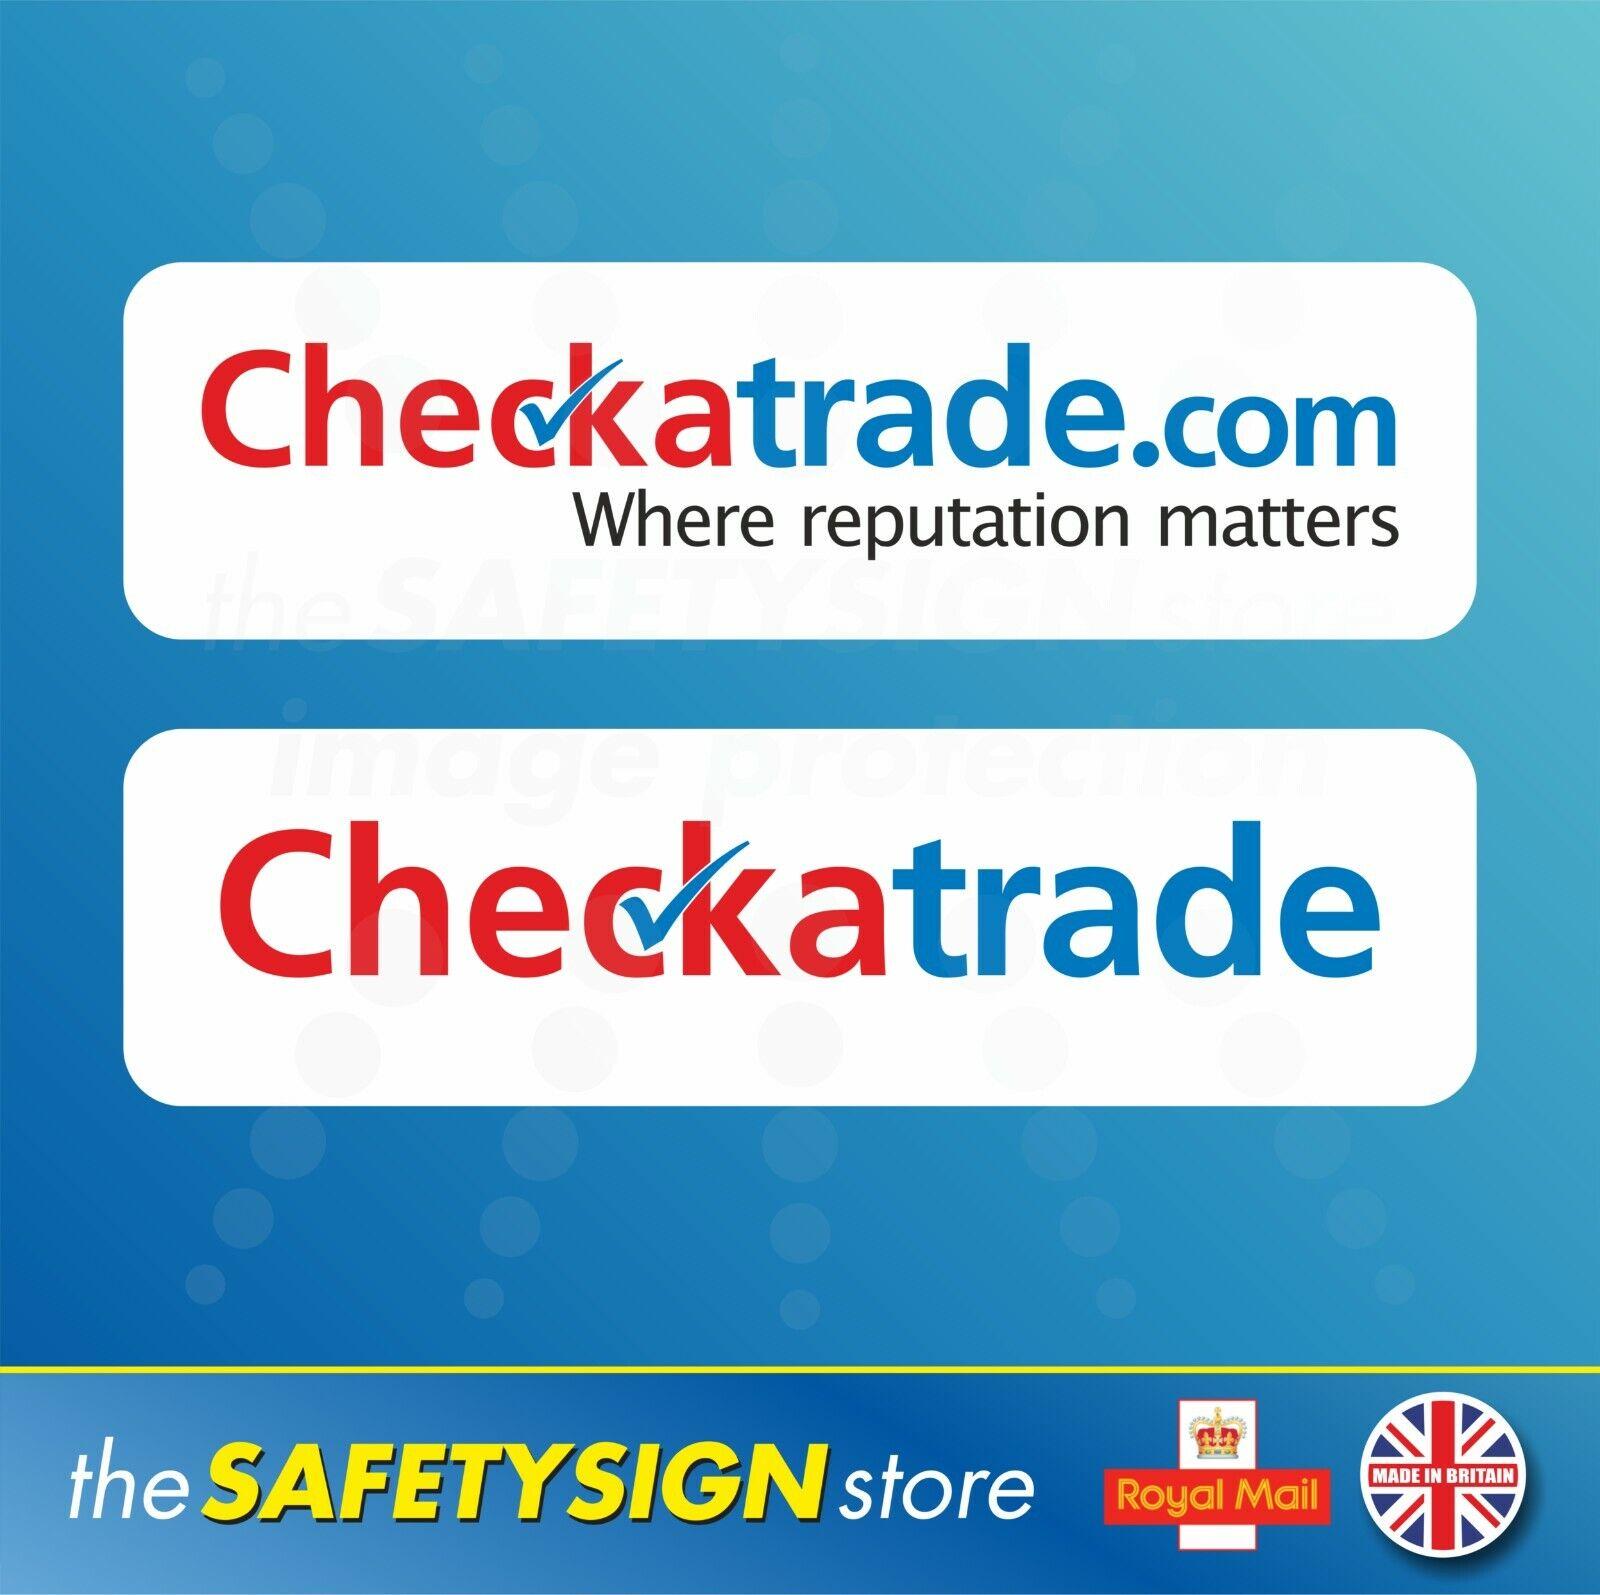 Checkatrade.com Where reputation matters Check a trade Stickers Magnetic Signs